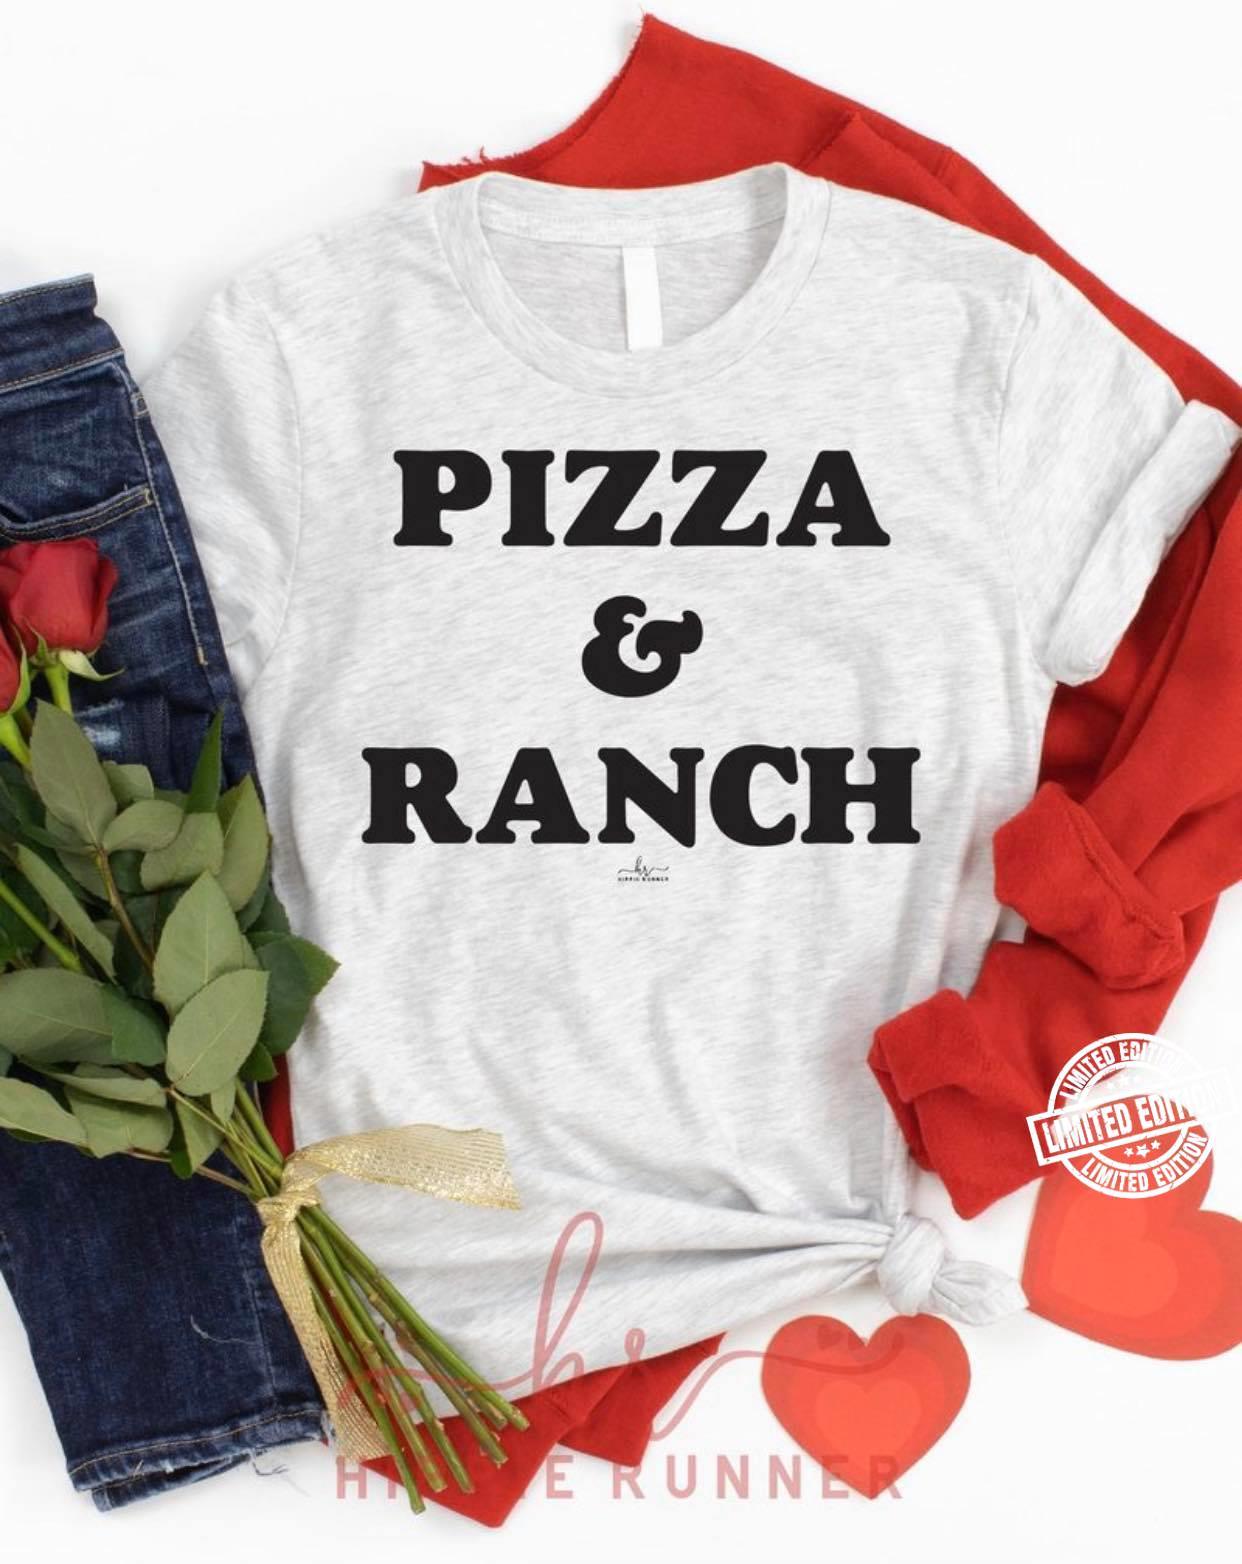 Pizza and ranch shirt